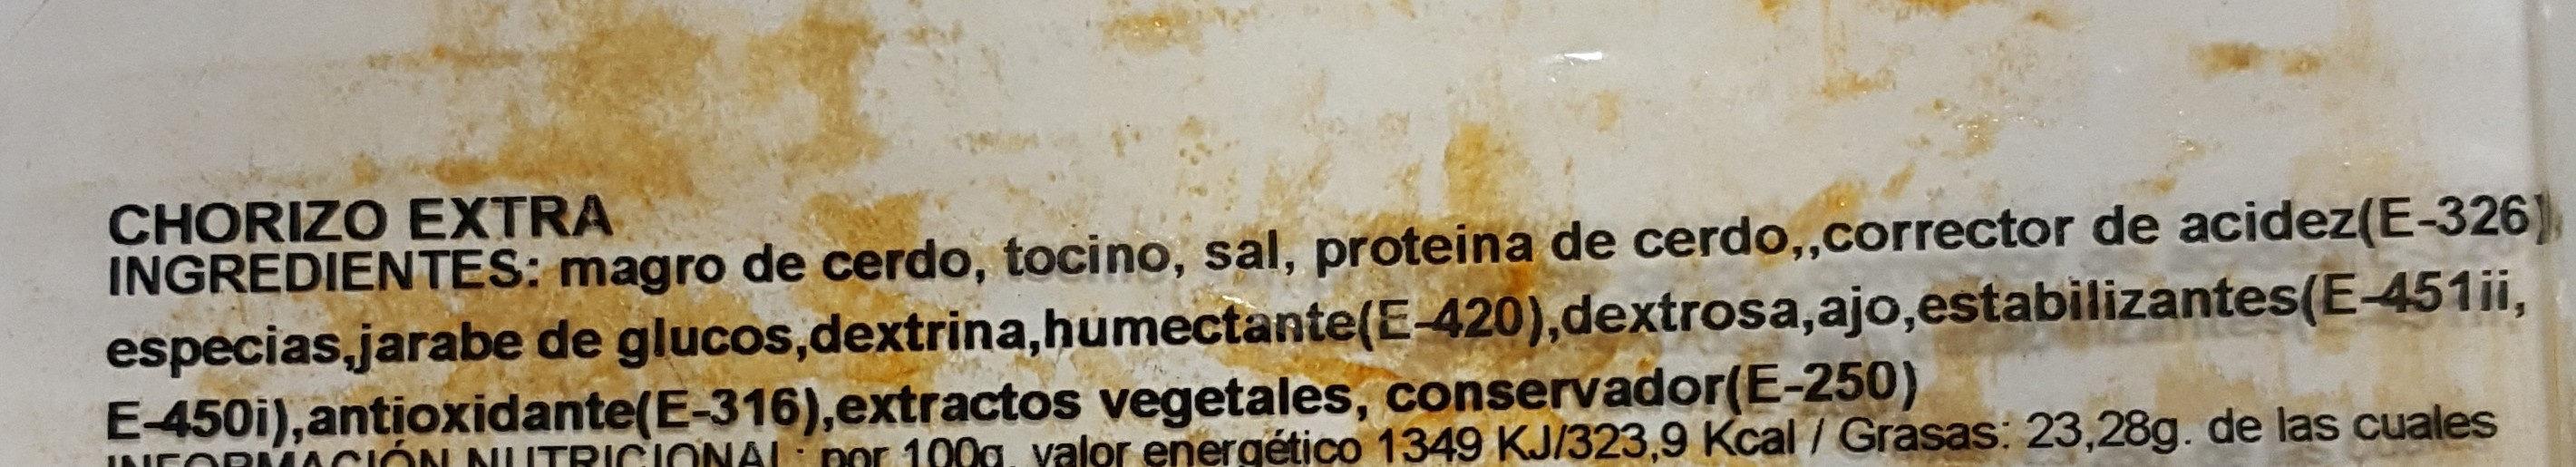 Chorizo Extra - Ingredientes - es